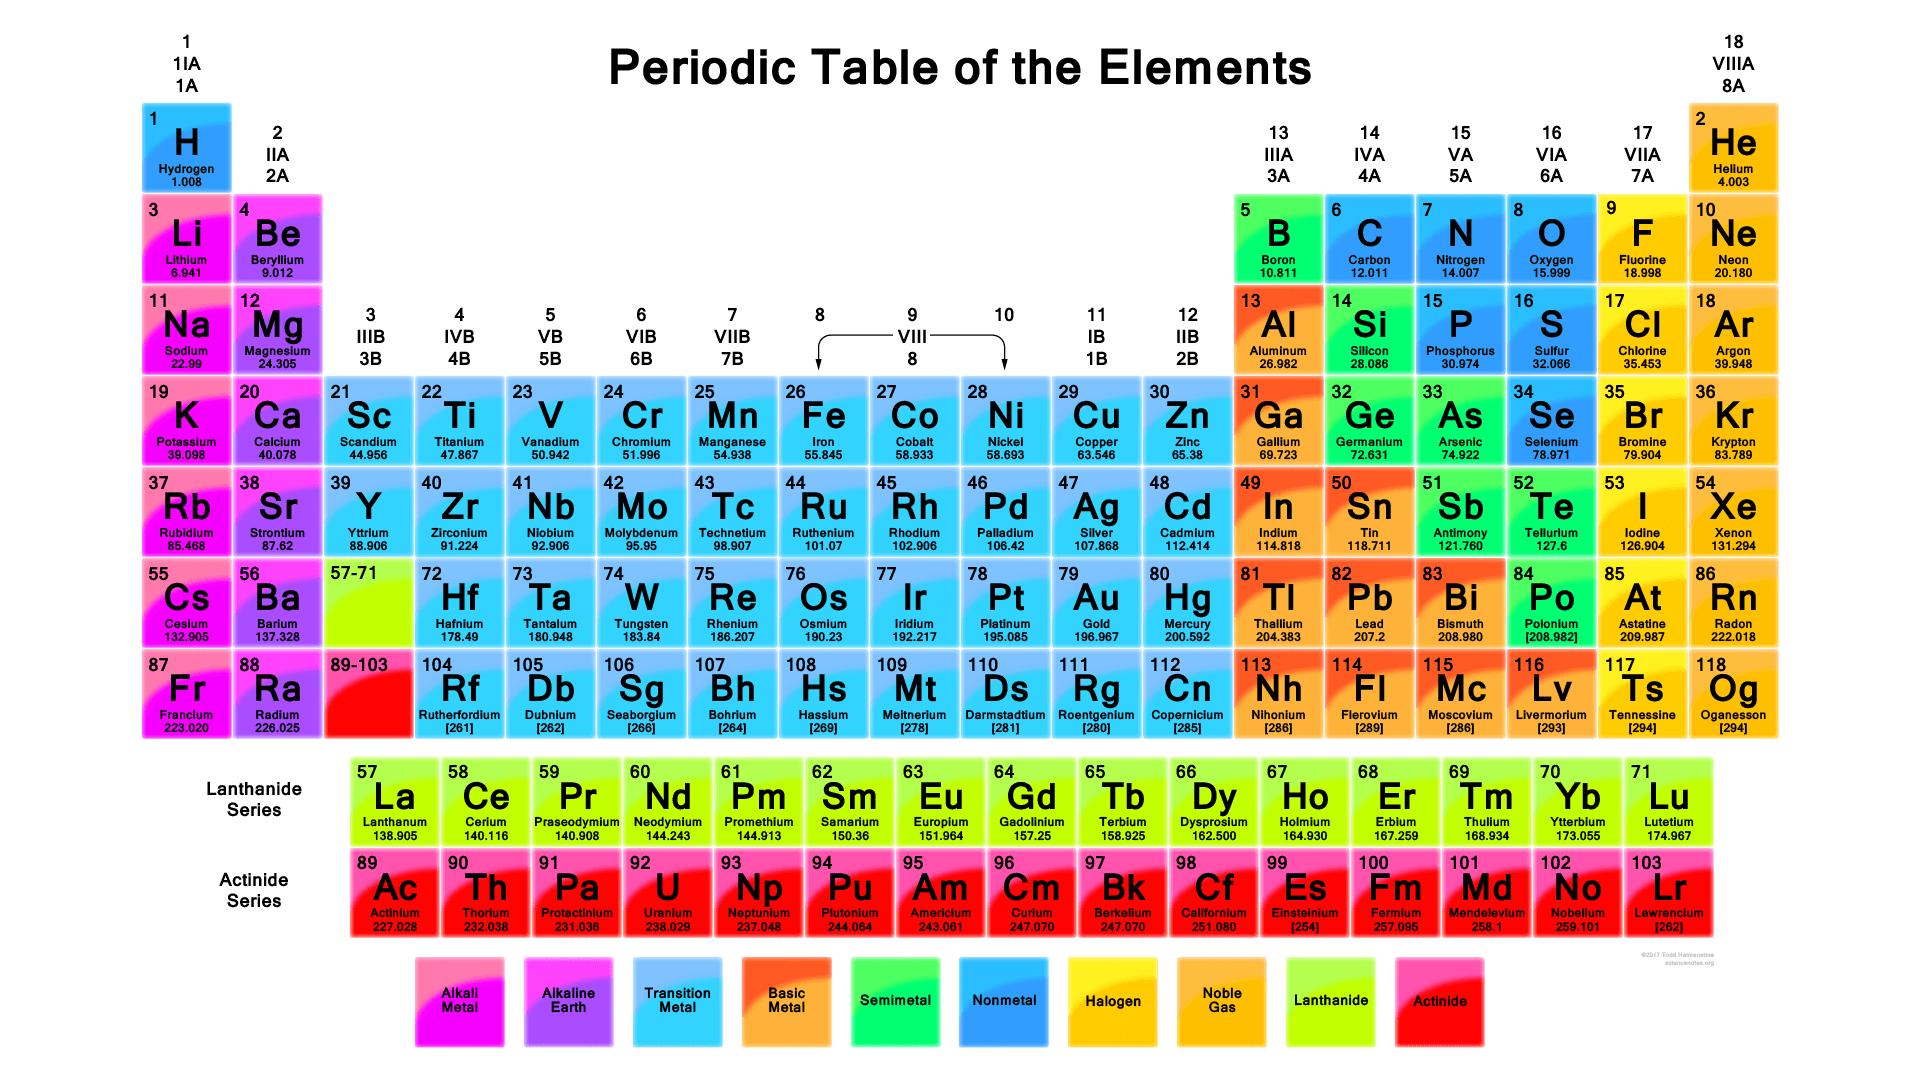 https://sciencenotes.org/periodic-table-pdf-2/